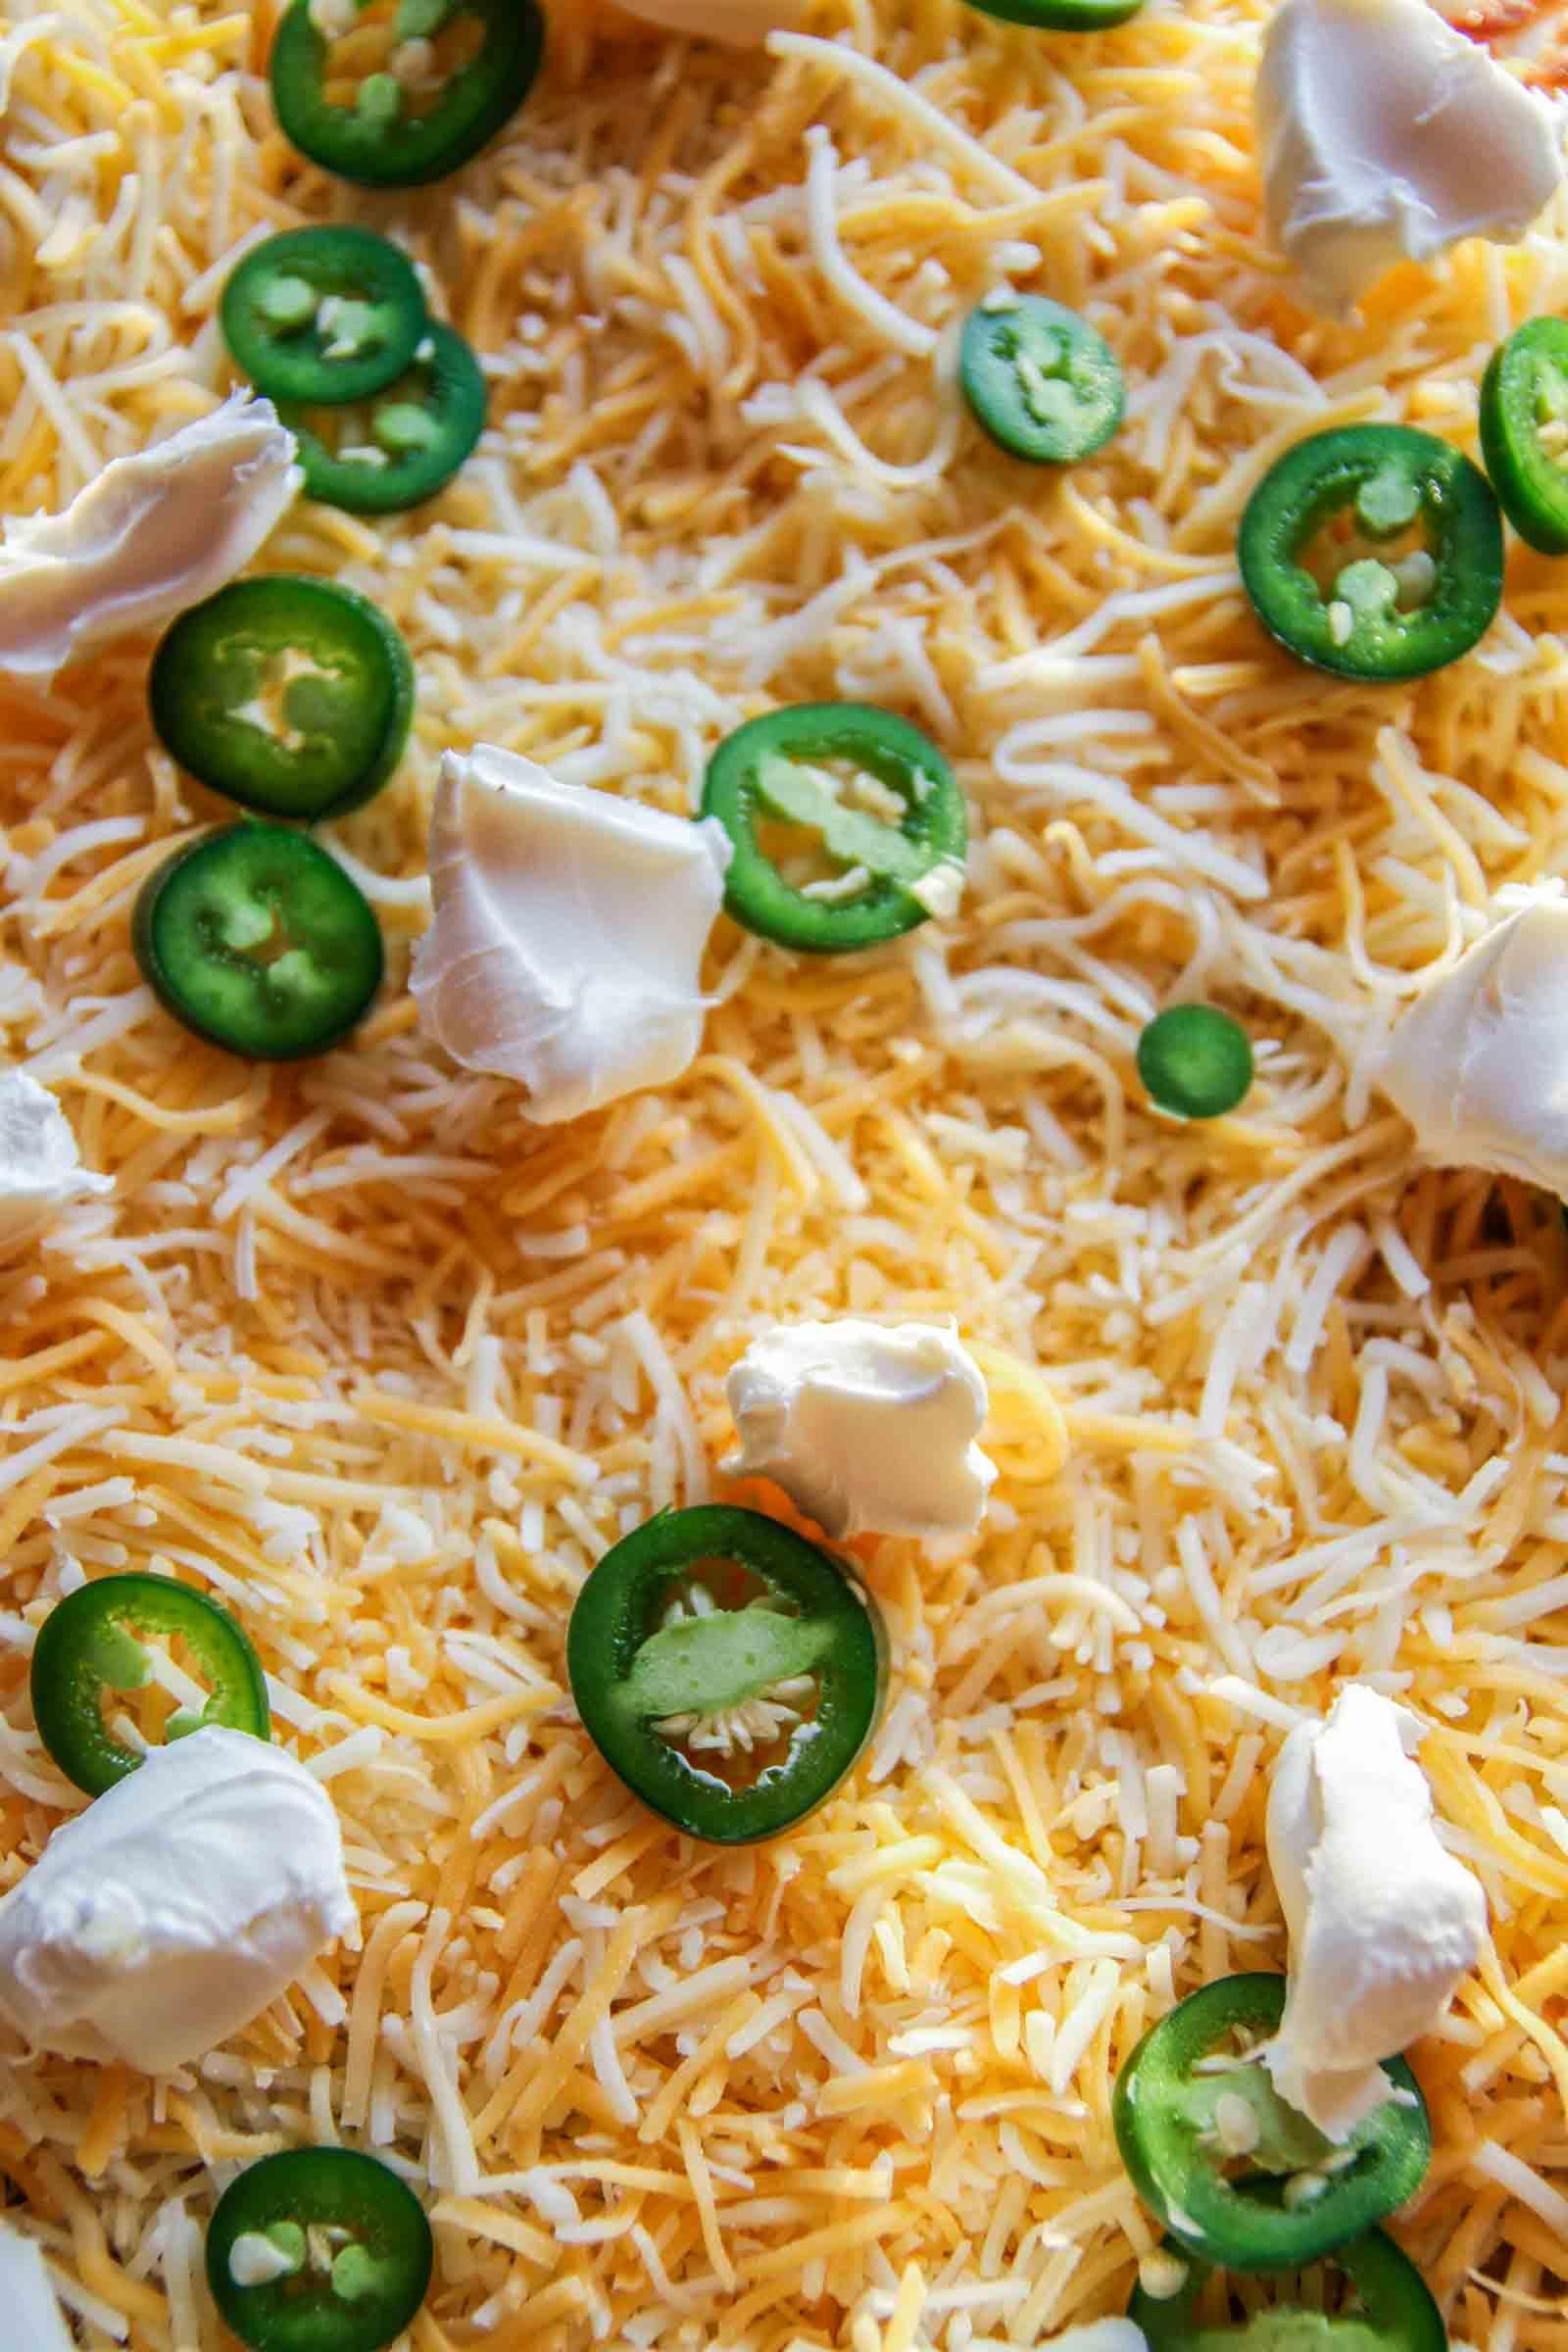 Jalapeno enchilada cream cheese pizza. Meatless Monday pizza recipe from @sweetphi